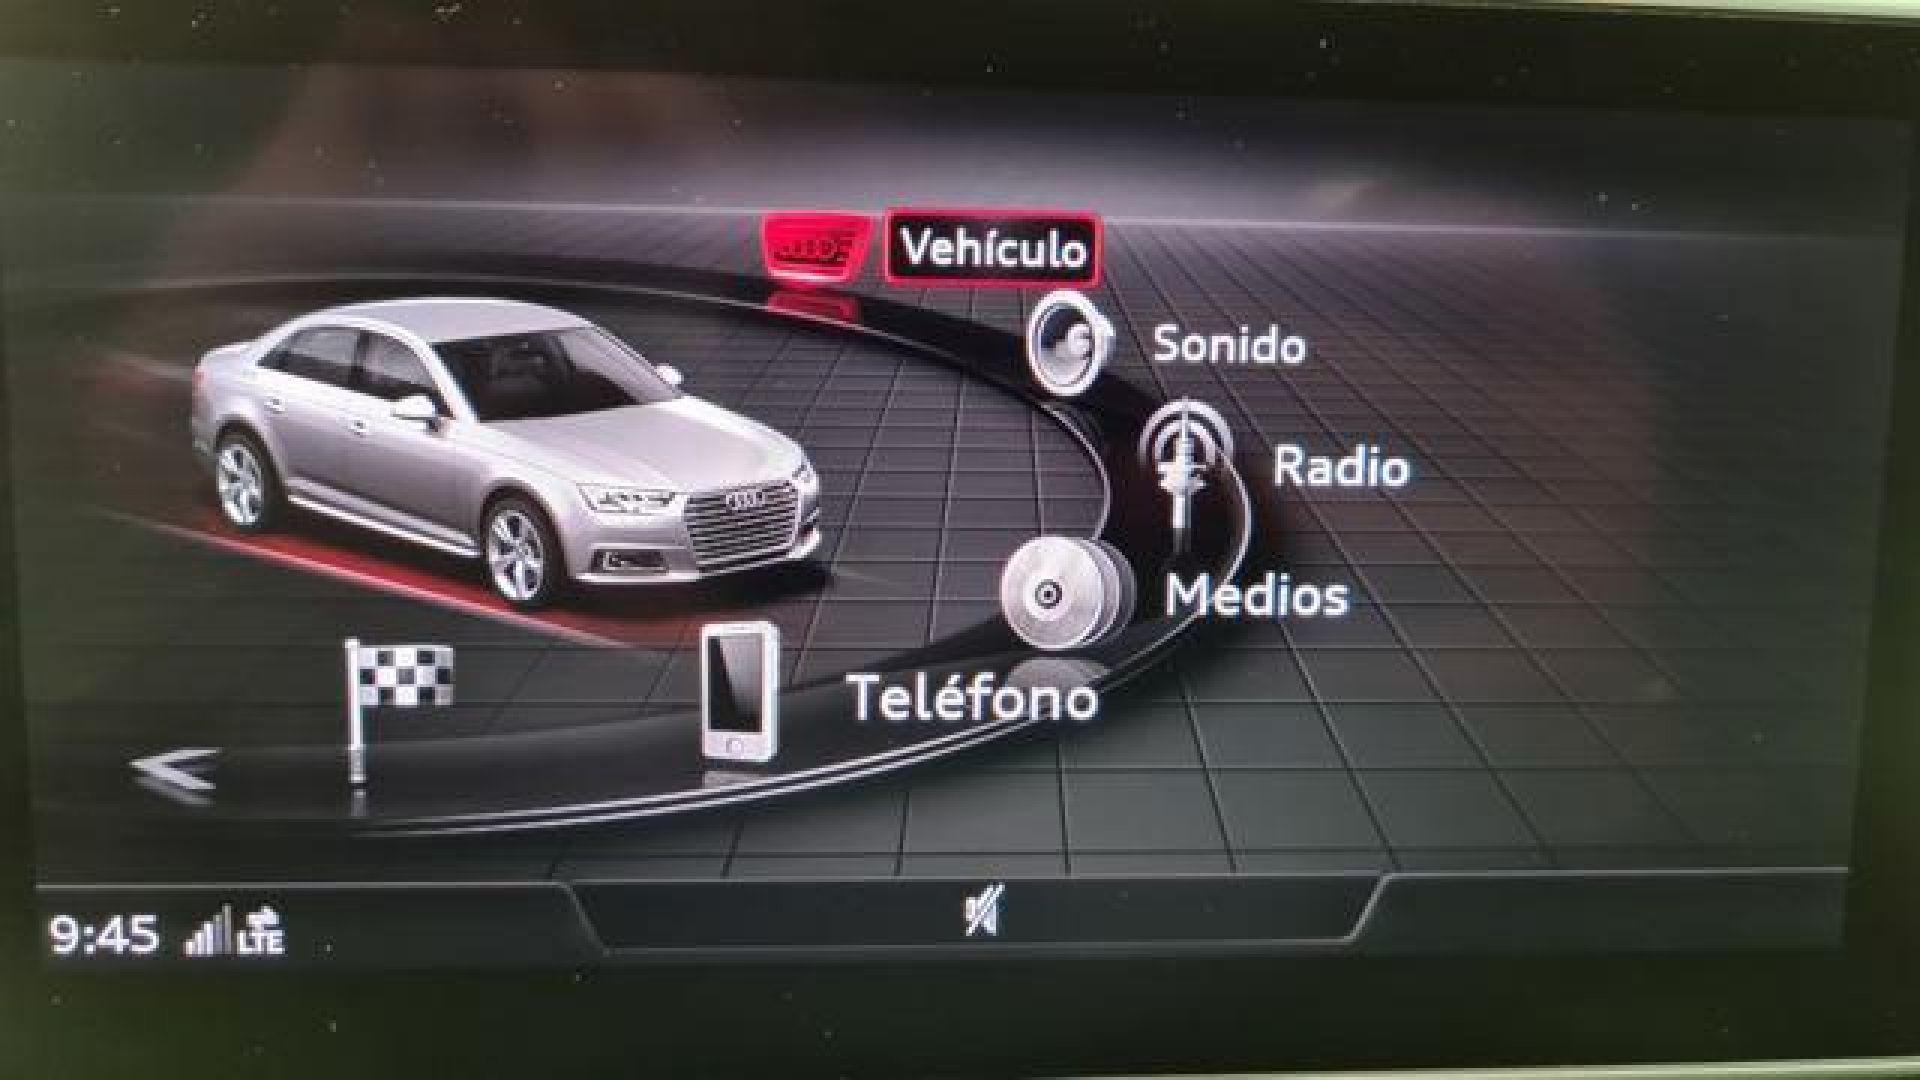 Audi A4 Avant 2.0 TDI 150CV ultra design edition